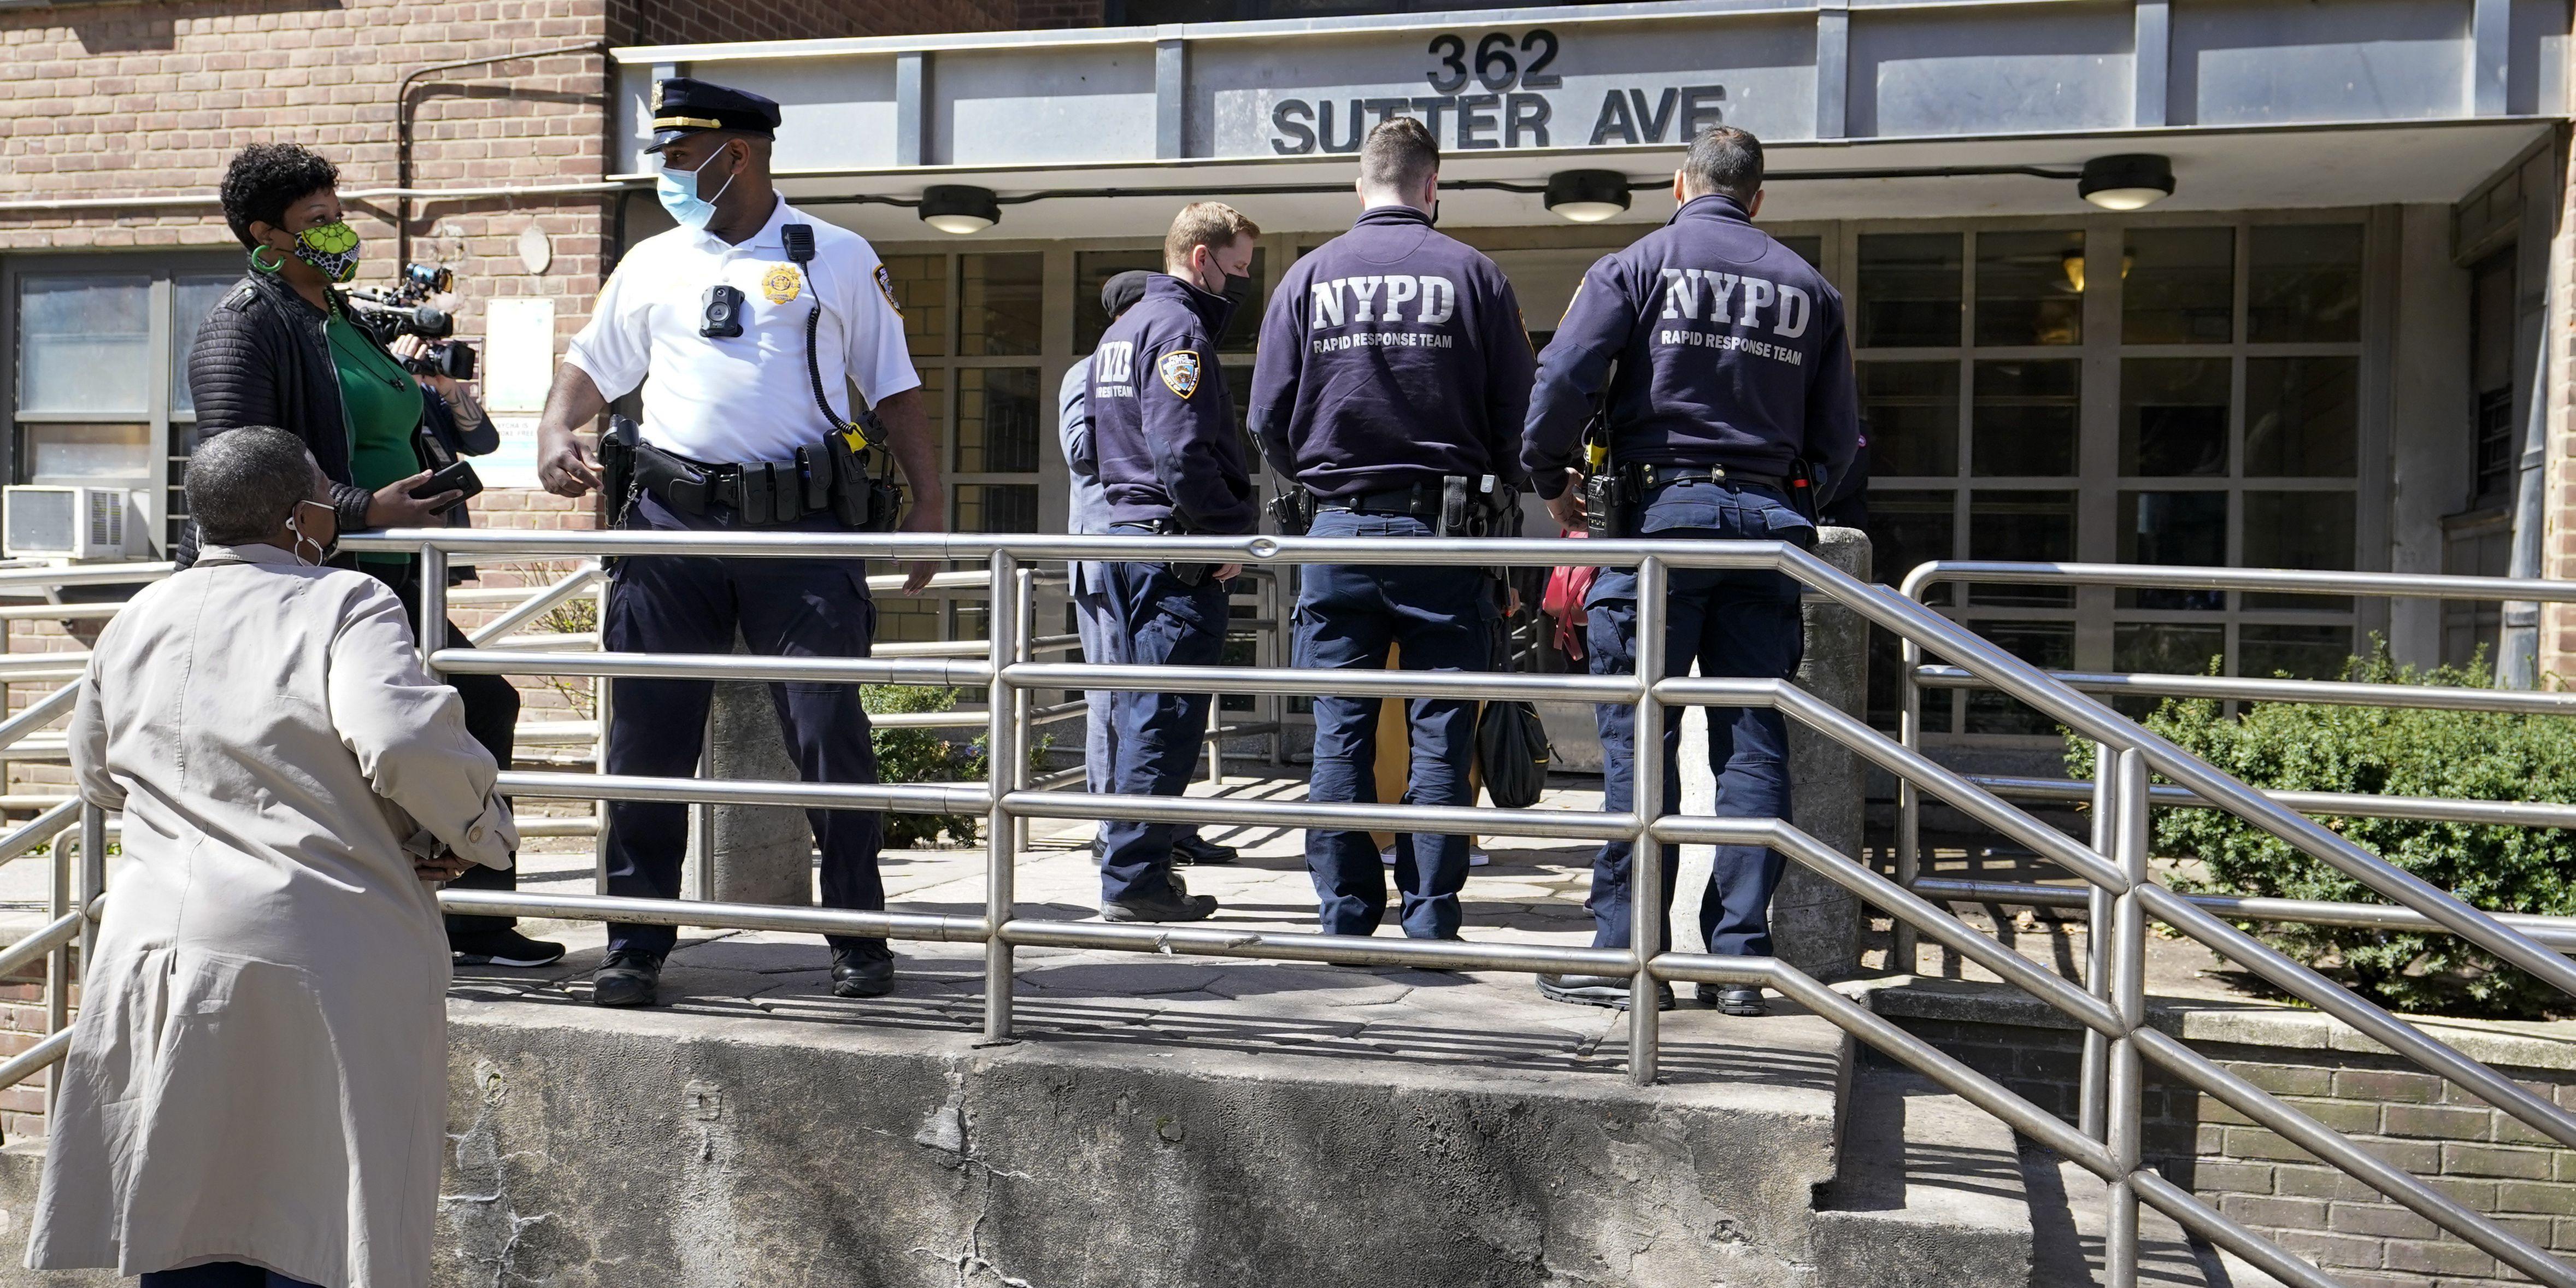 Police: Man kills 3, himself at daughter's birthday in NYC